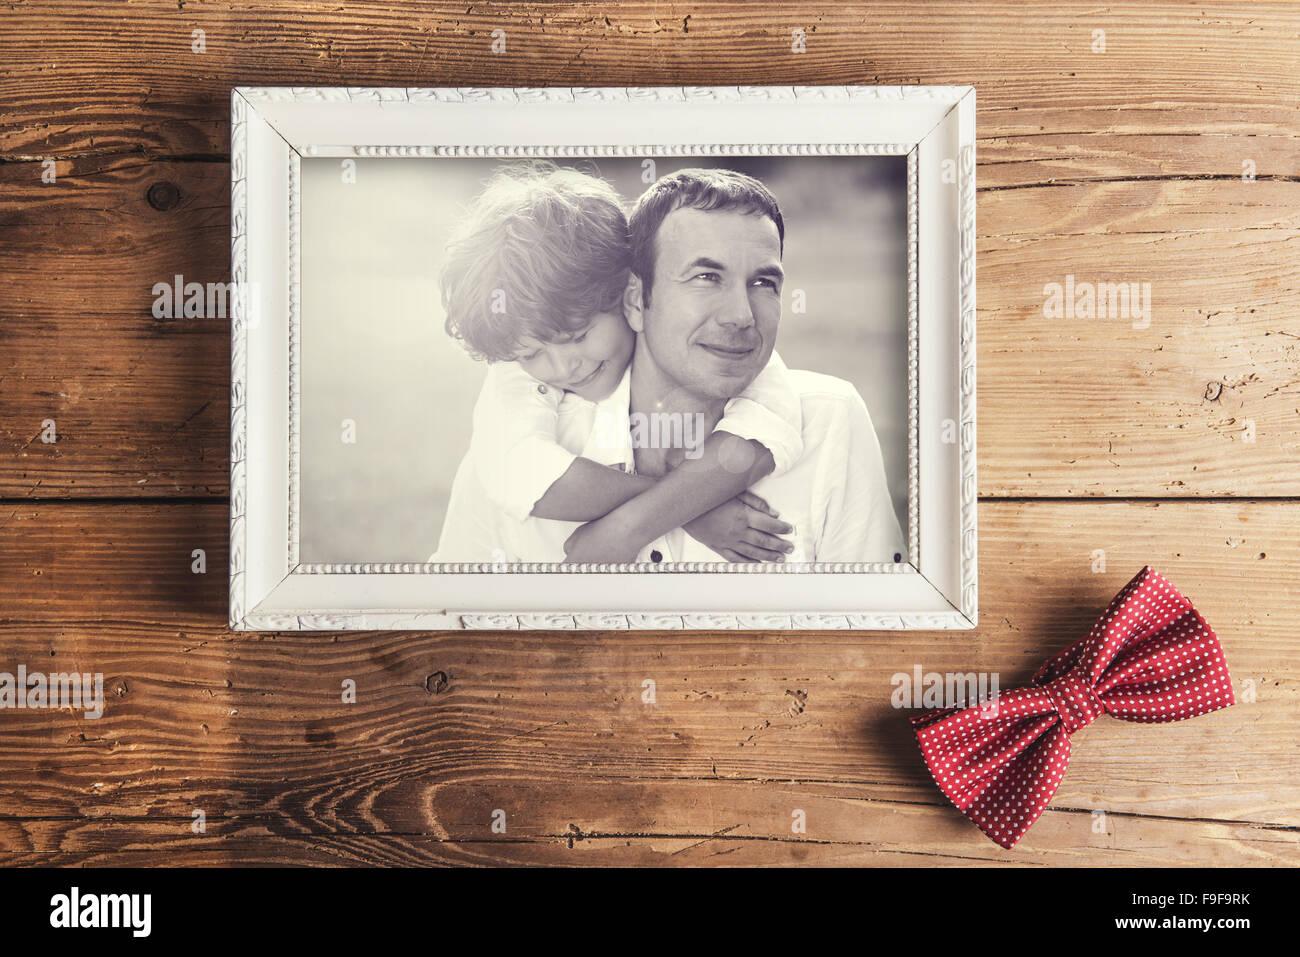 Decorative Wall Tie Stockfotos & Decorative Wall Tie Bilder - Seite ...